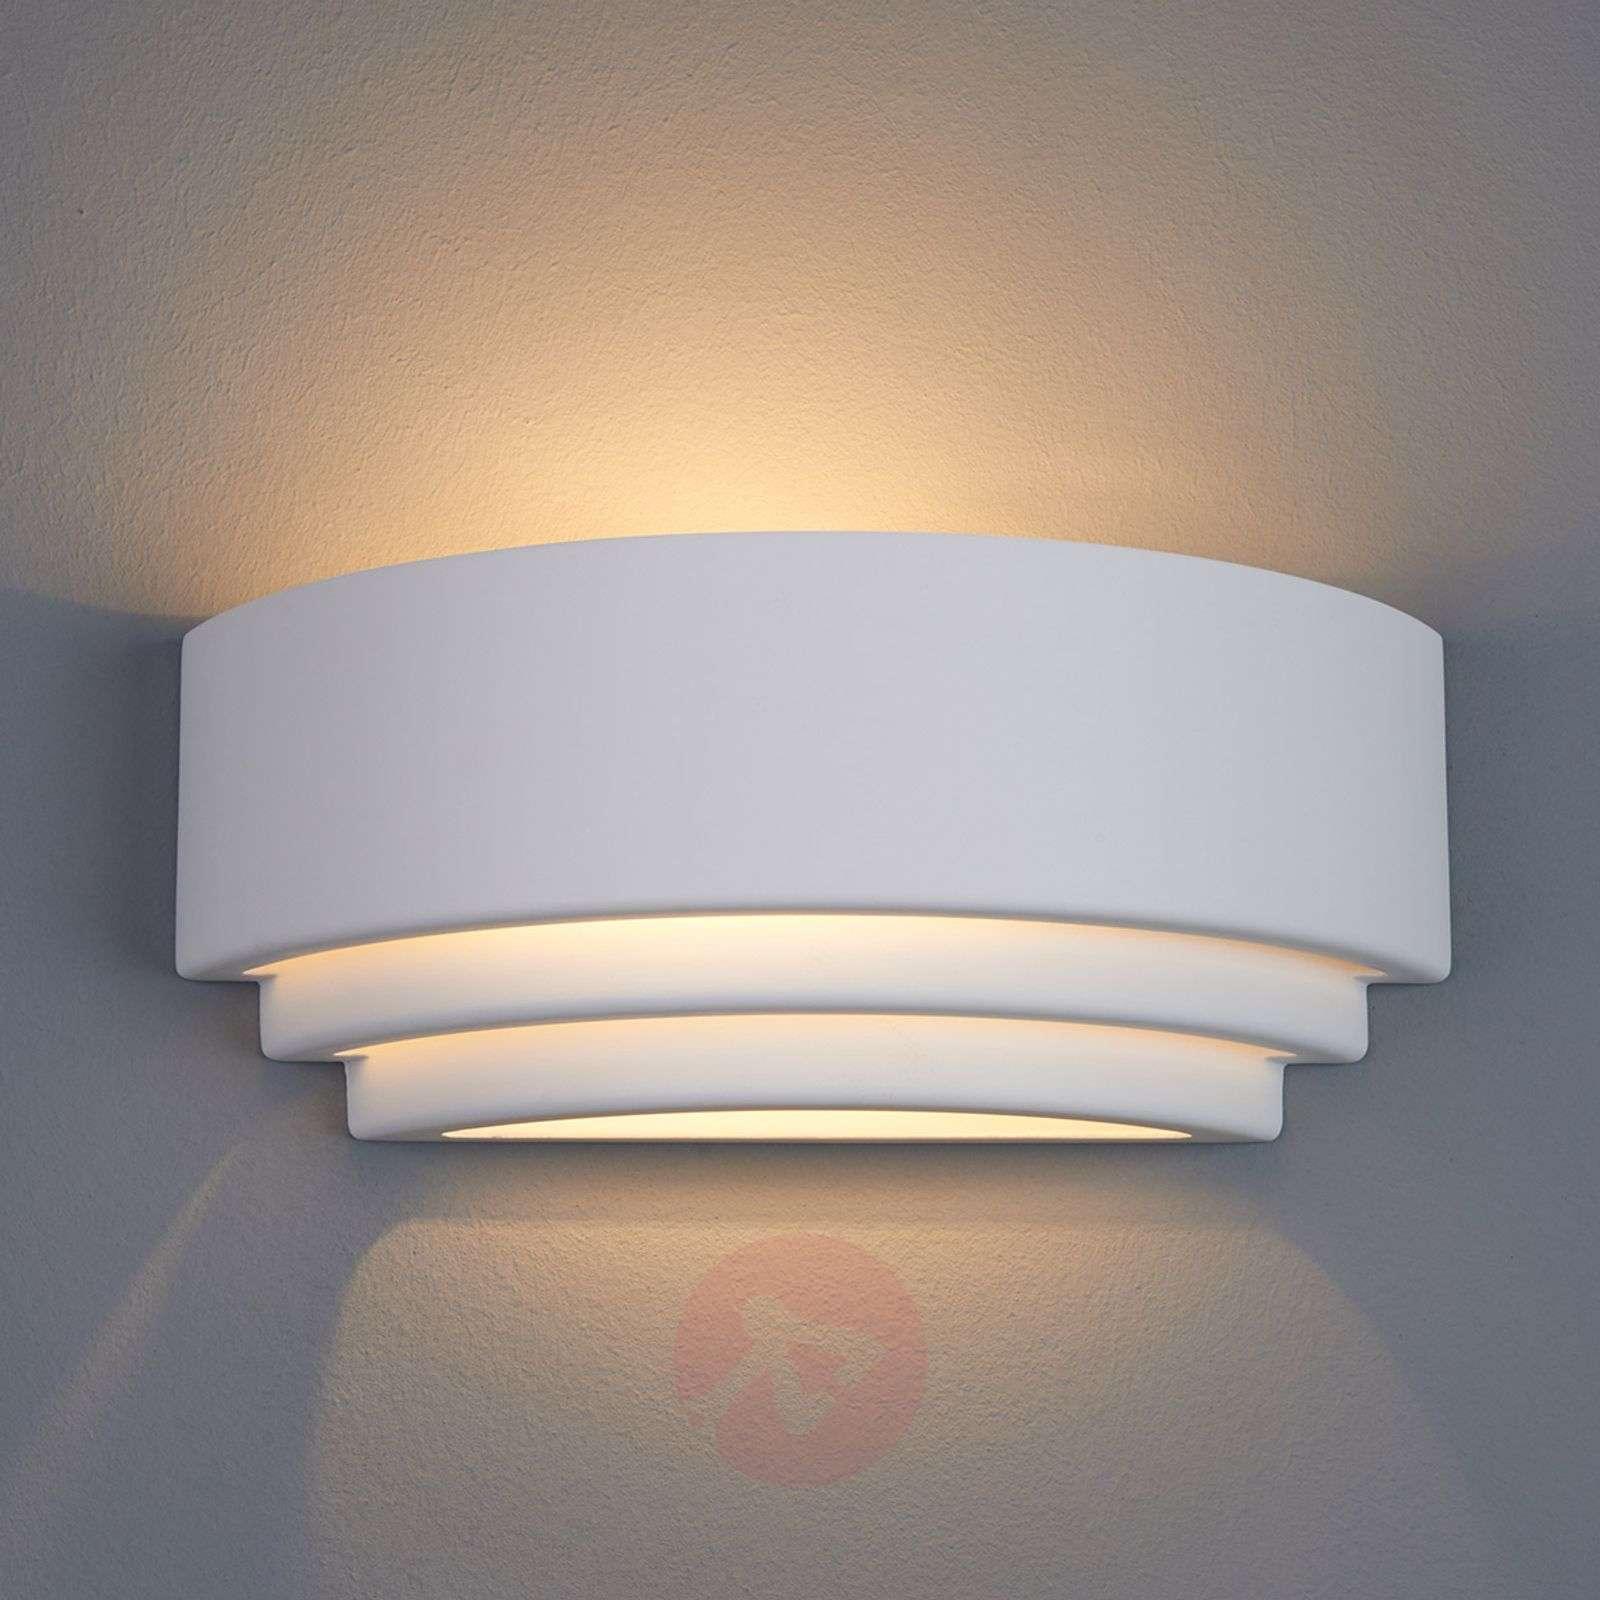 Biana Wall Light Semi-Circular Plaster-9613023-01